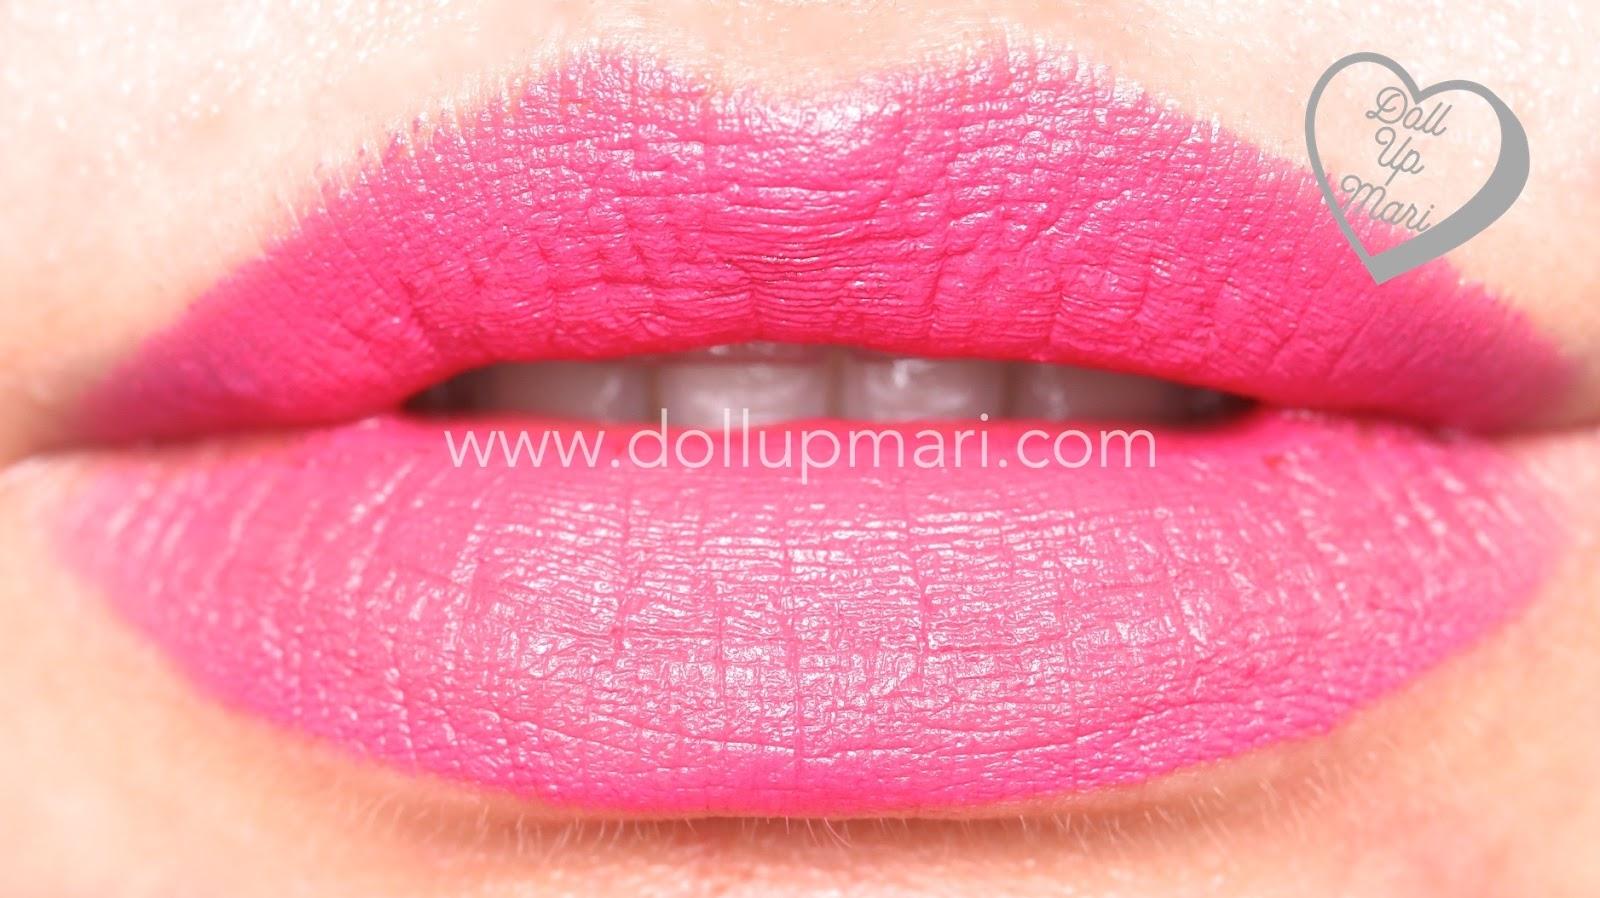 lip swatch of Adoring Love shade of AVON Perfectly Matte Lipstick